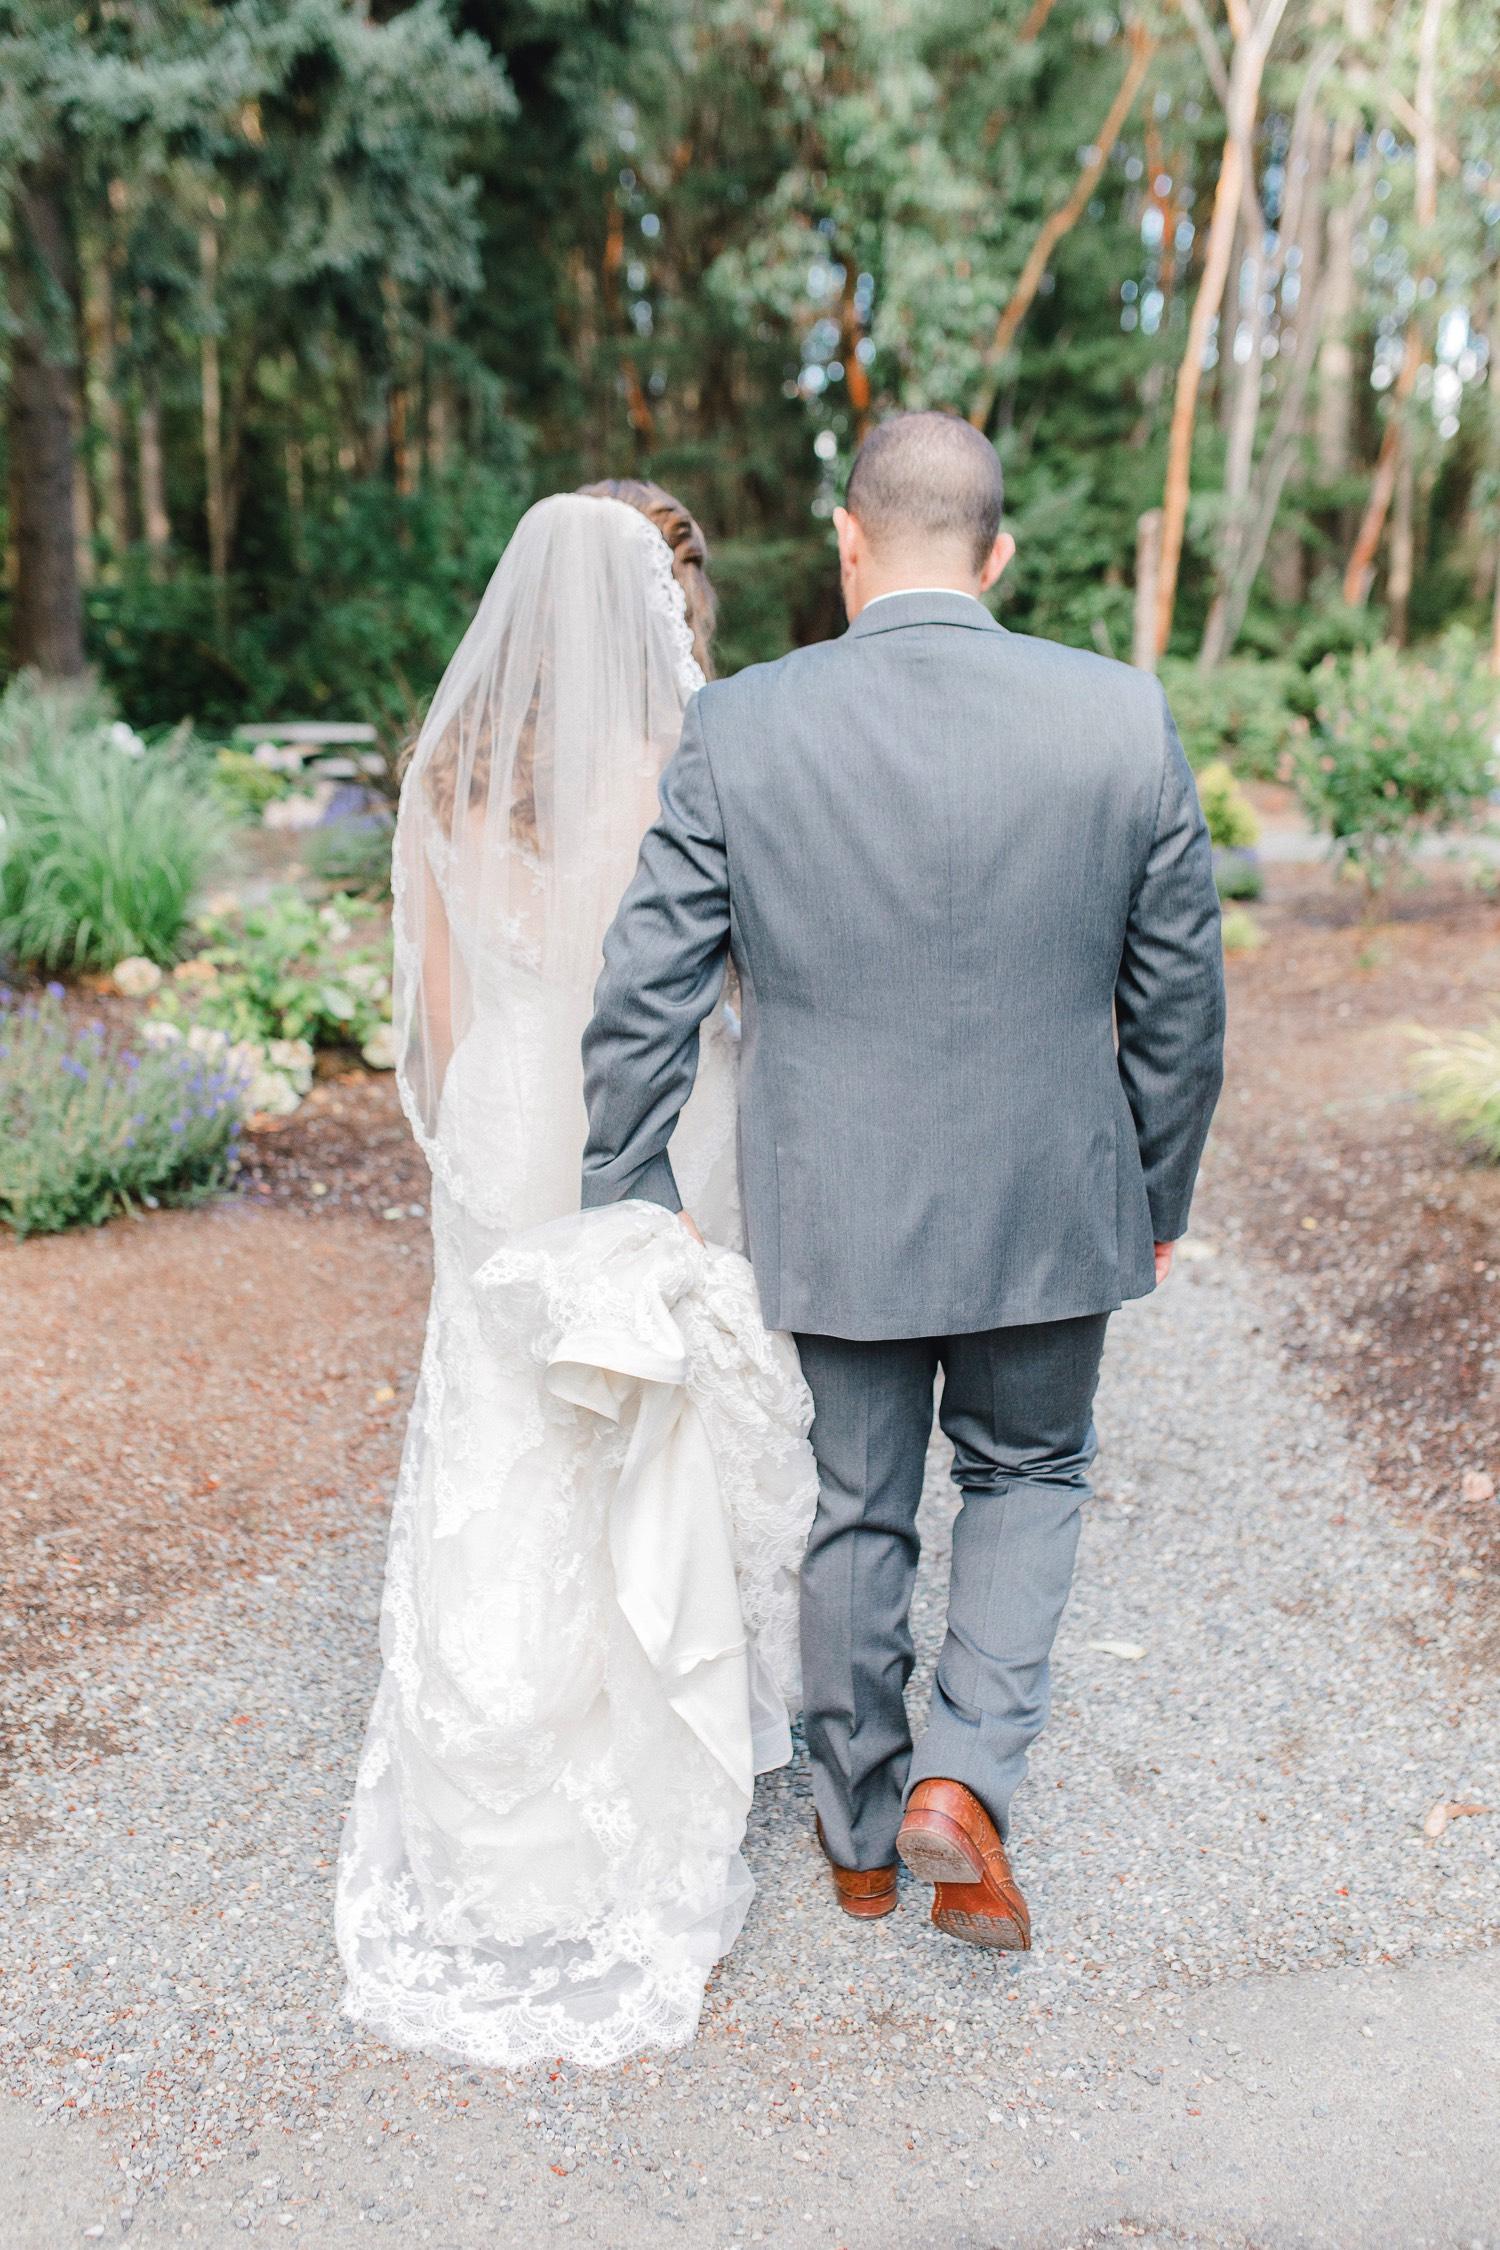 0000000000086_emmarosecompany_katiematt-2-49_Photographer_PNW_House_Robinswood_Emma_Light_Company_Airy_Rose_and_Wedding_Seattle.jpg